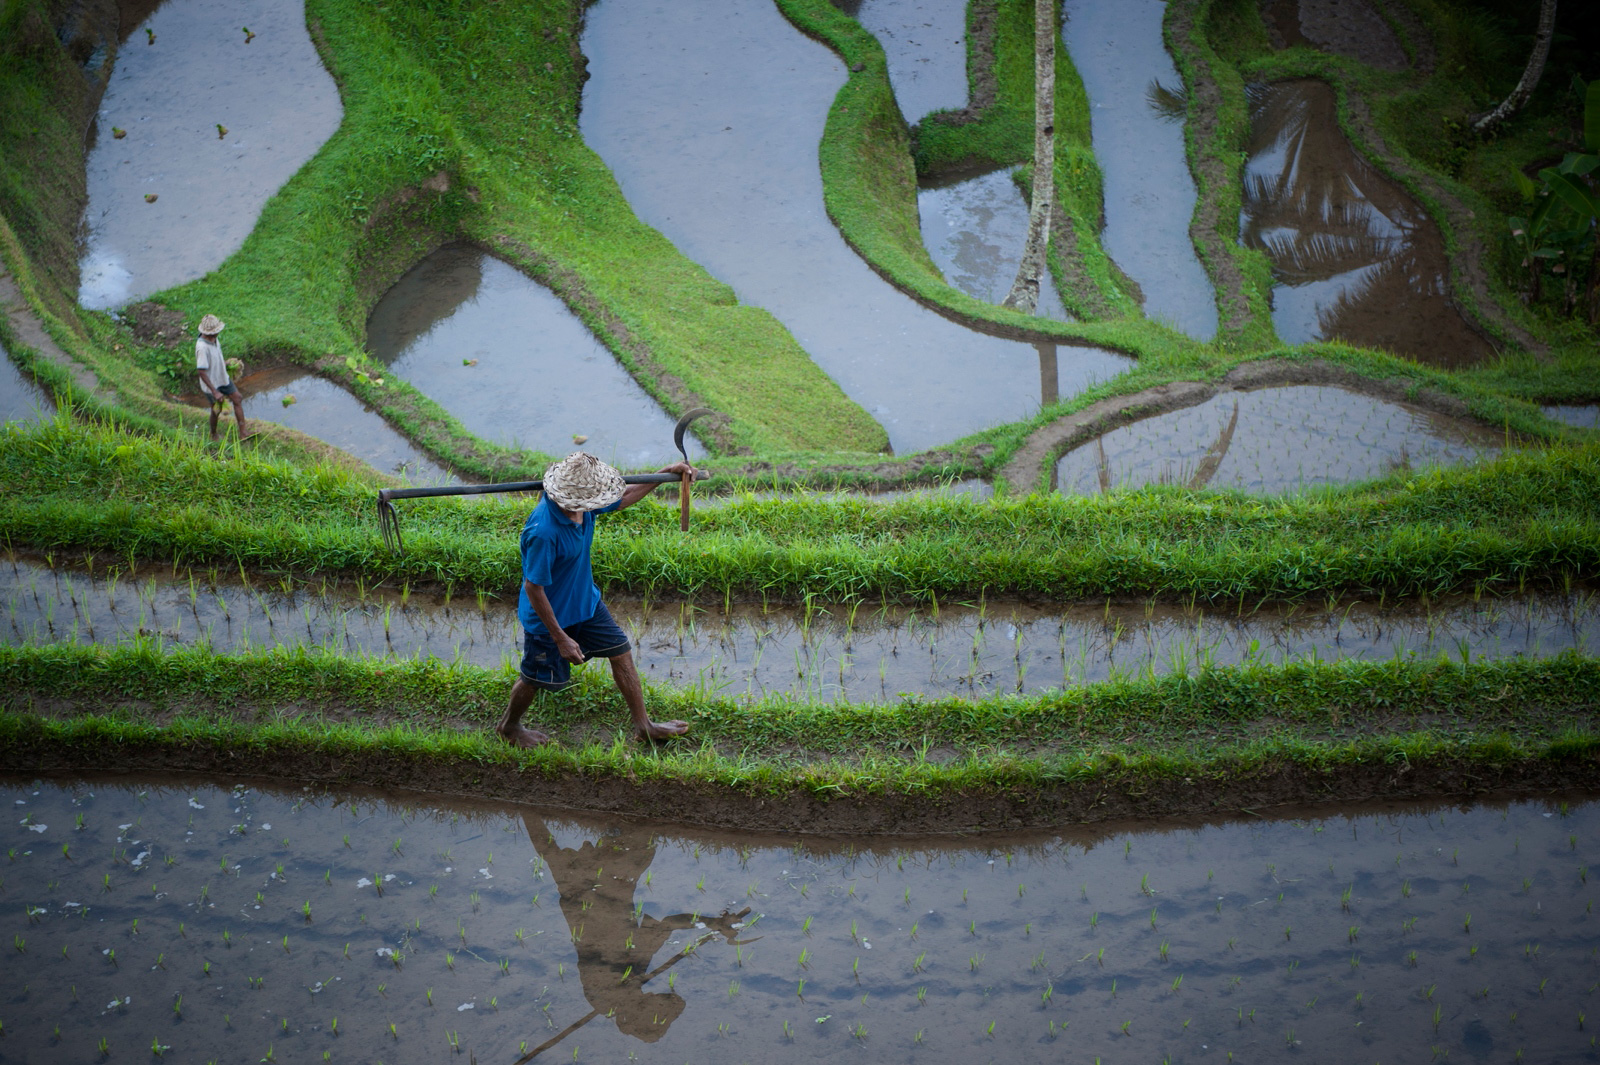 Bali-Ubud-South-African-Travel-Photographer-Jacki-Bruniquel-001